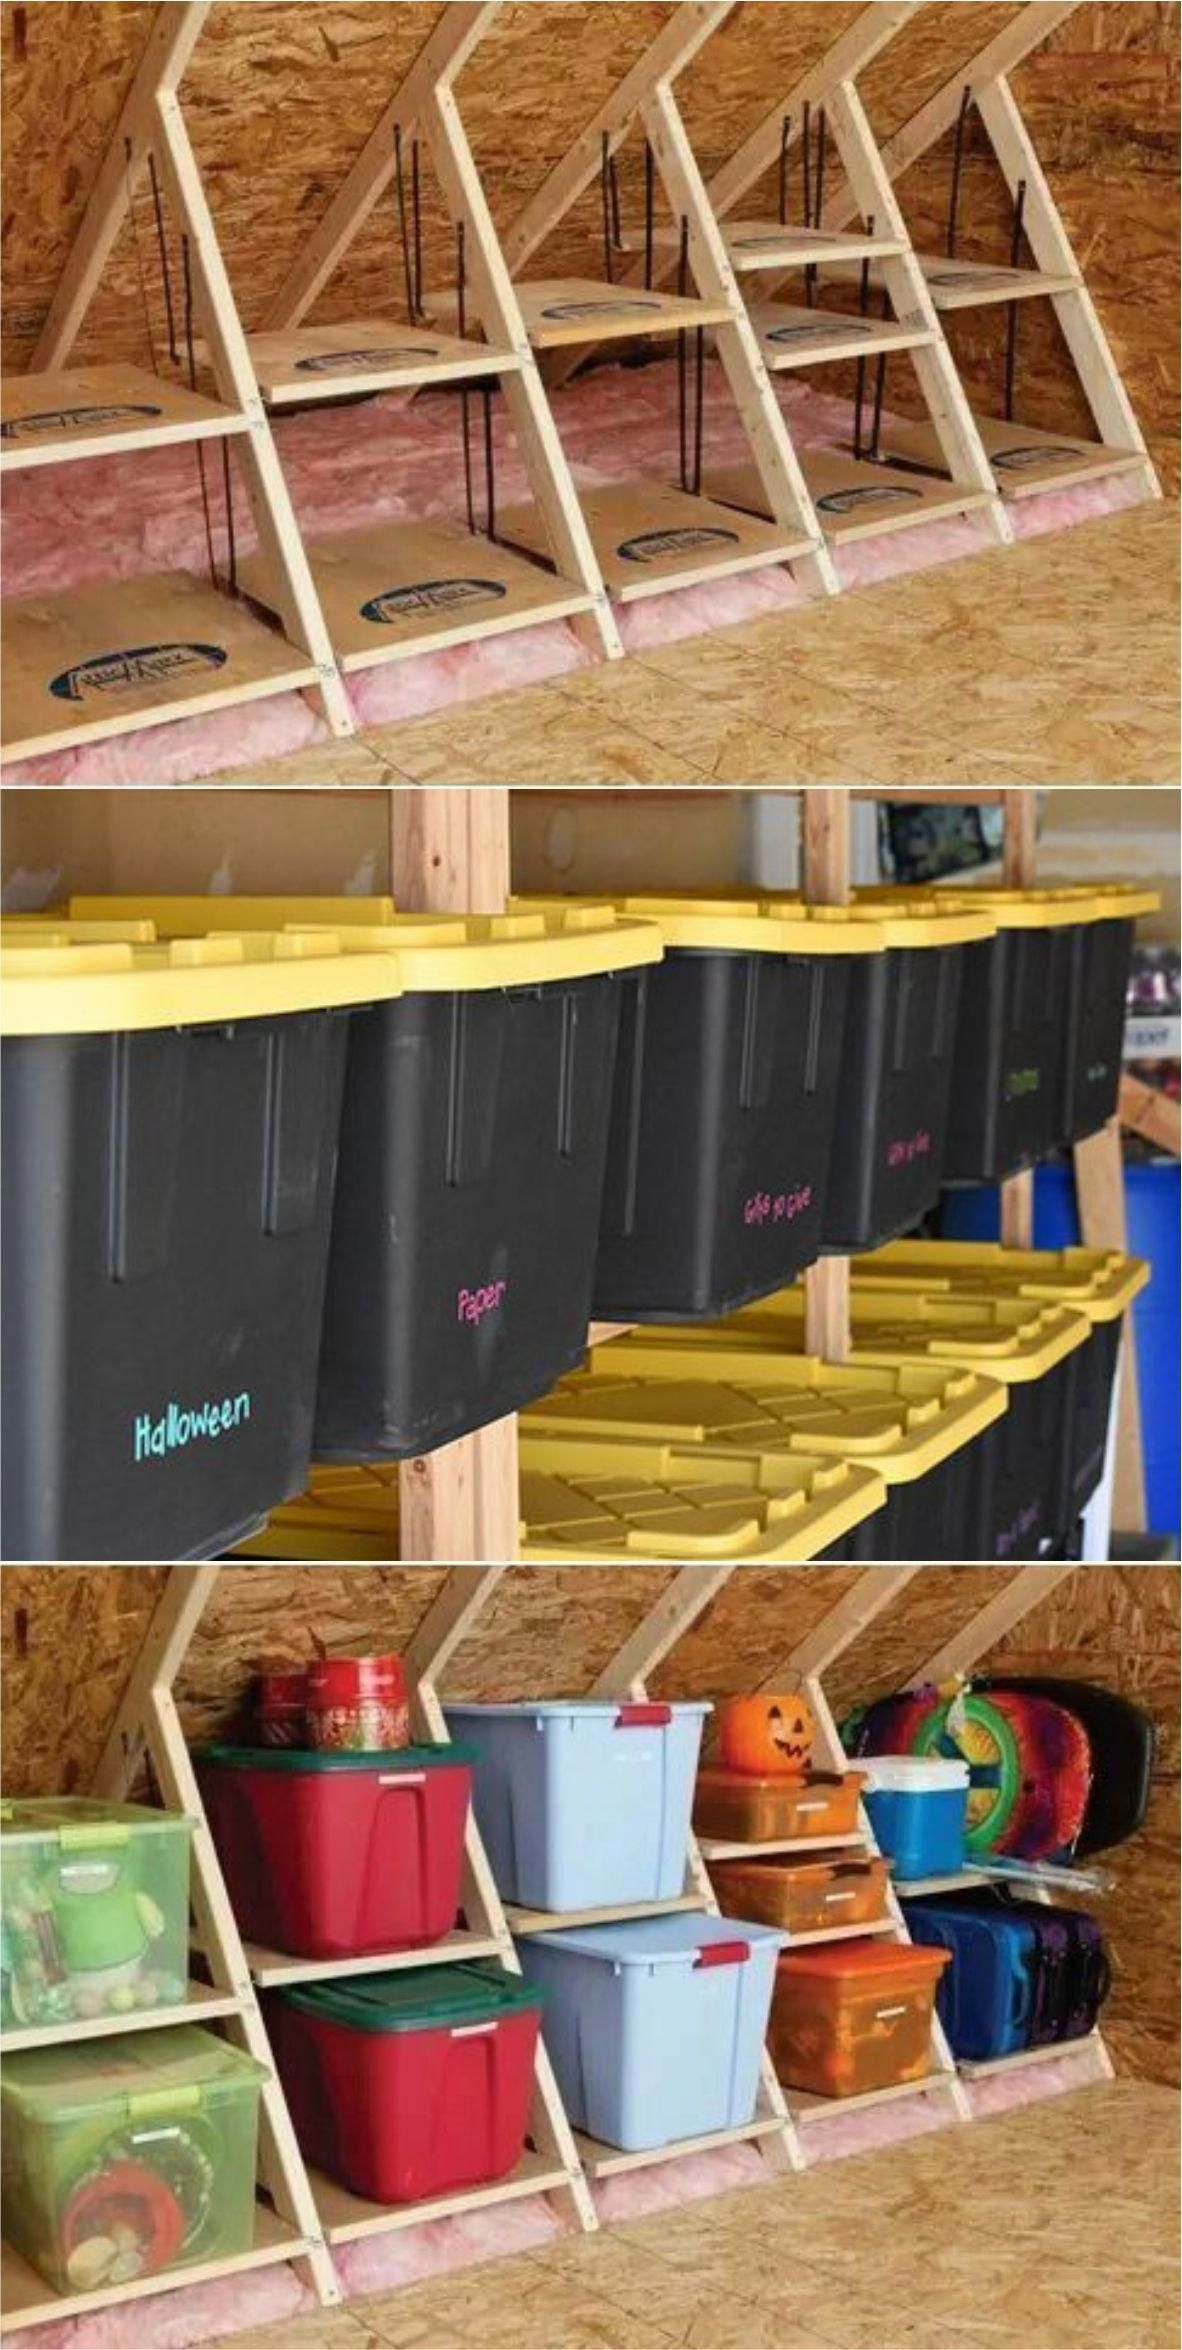 Hot Rod Decor Garage Ideas For Man Cave Cool Garage Door Ideas 20190614 Garage Attic Storage Garage Attic Attic Storage